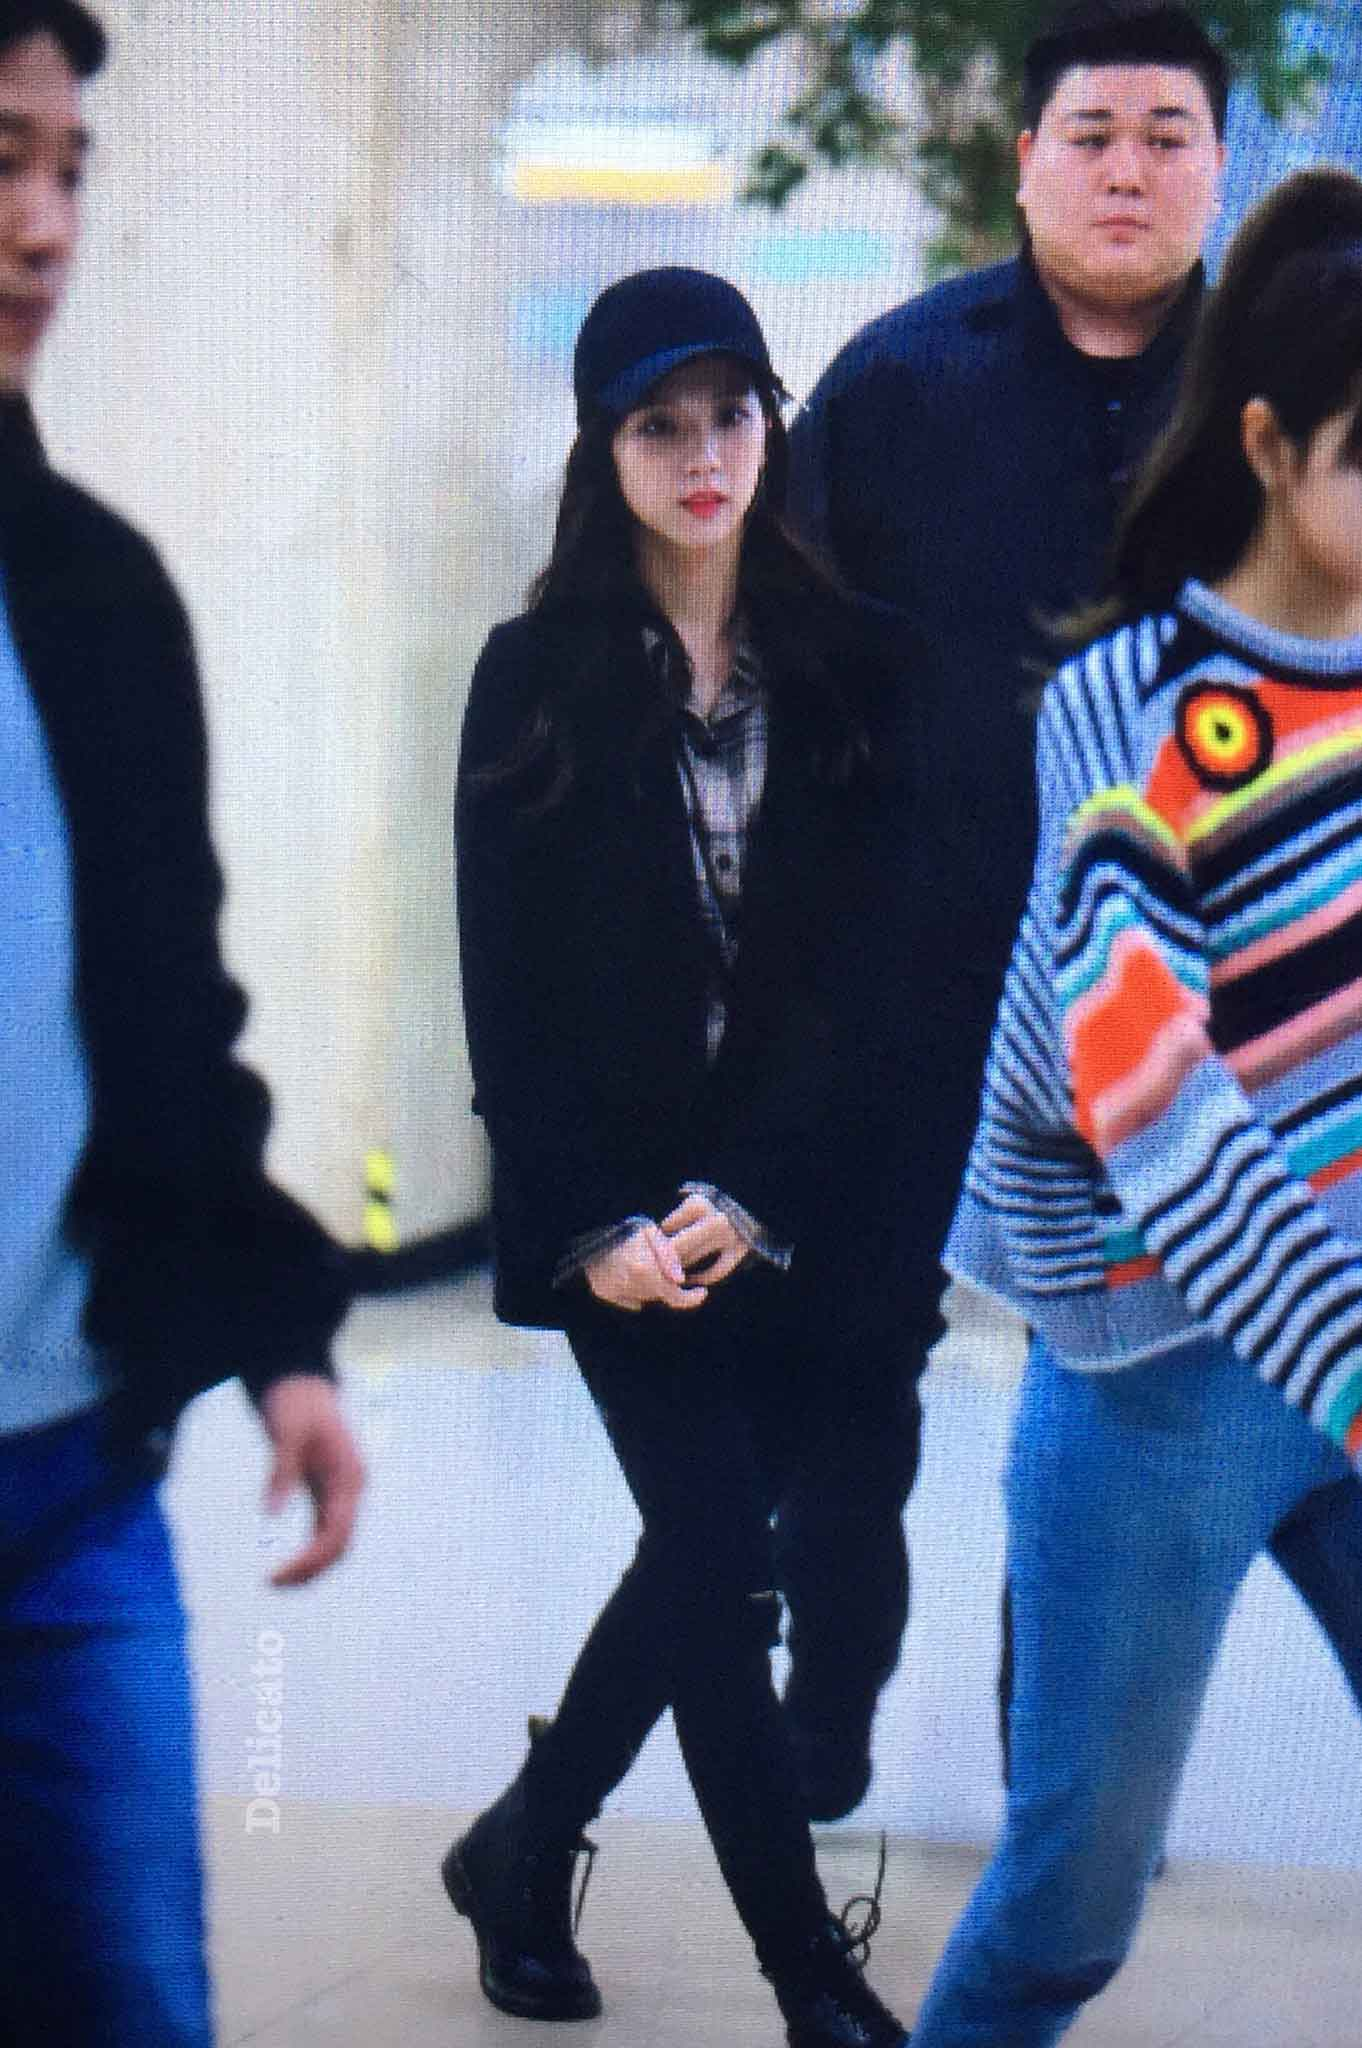 Blackpink Jisoo airport fashion black outfit wear cap hat